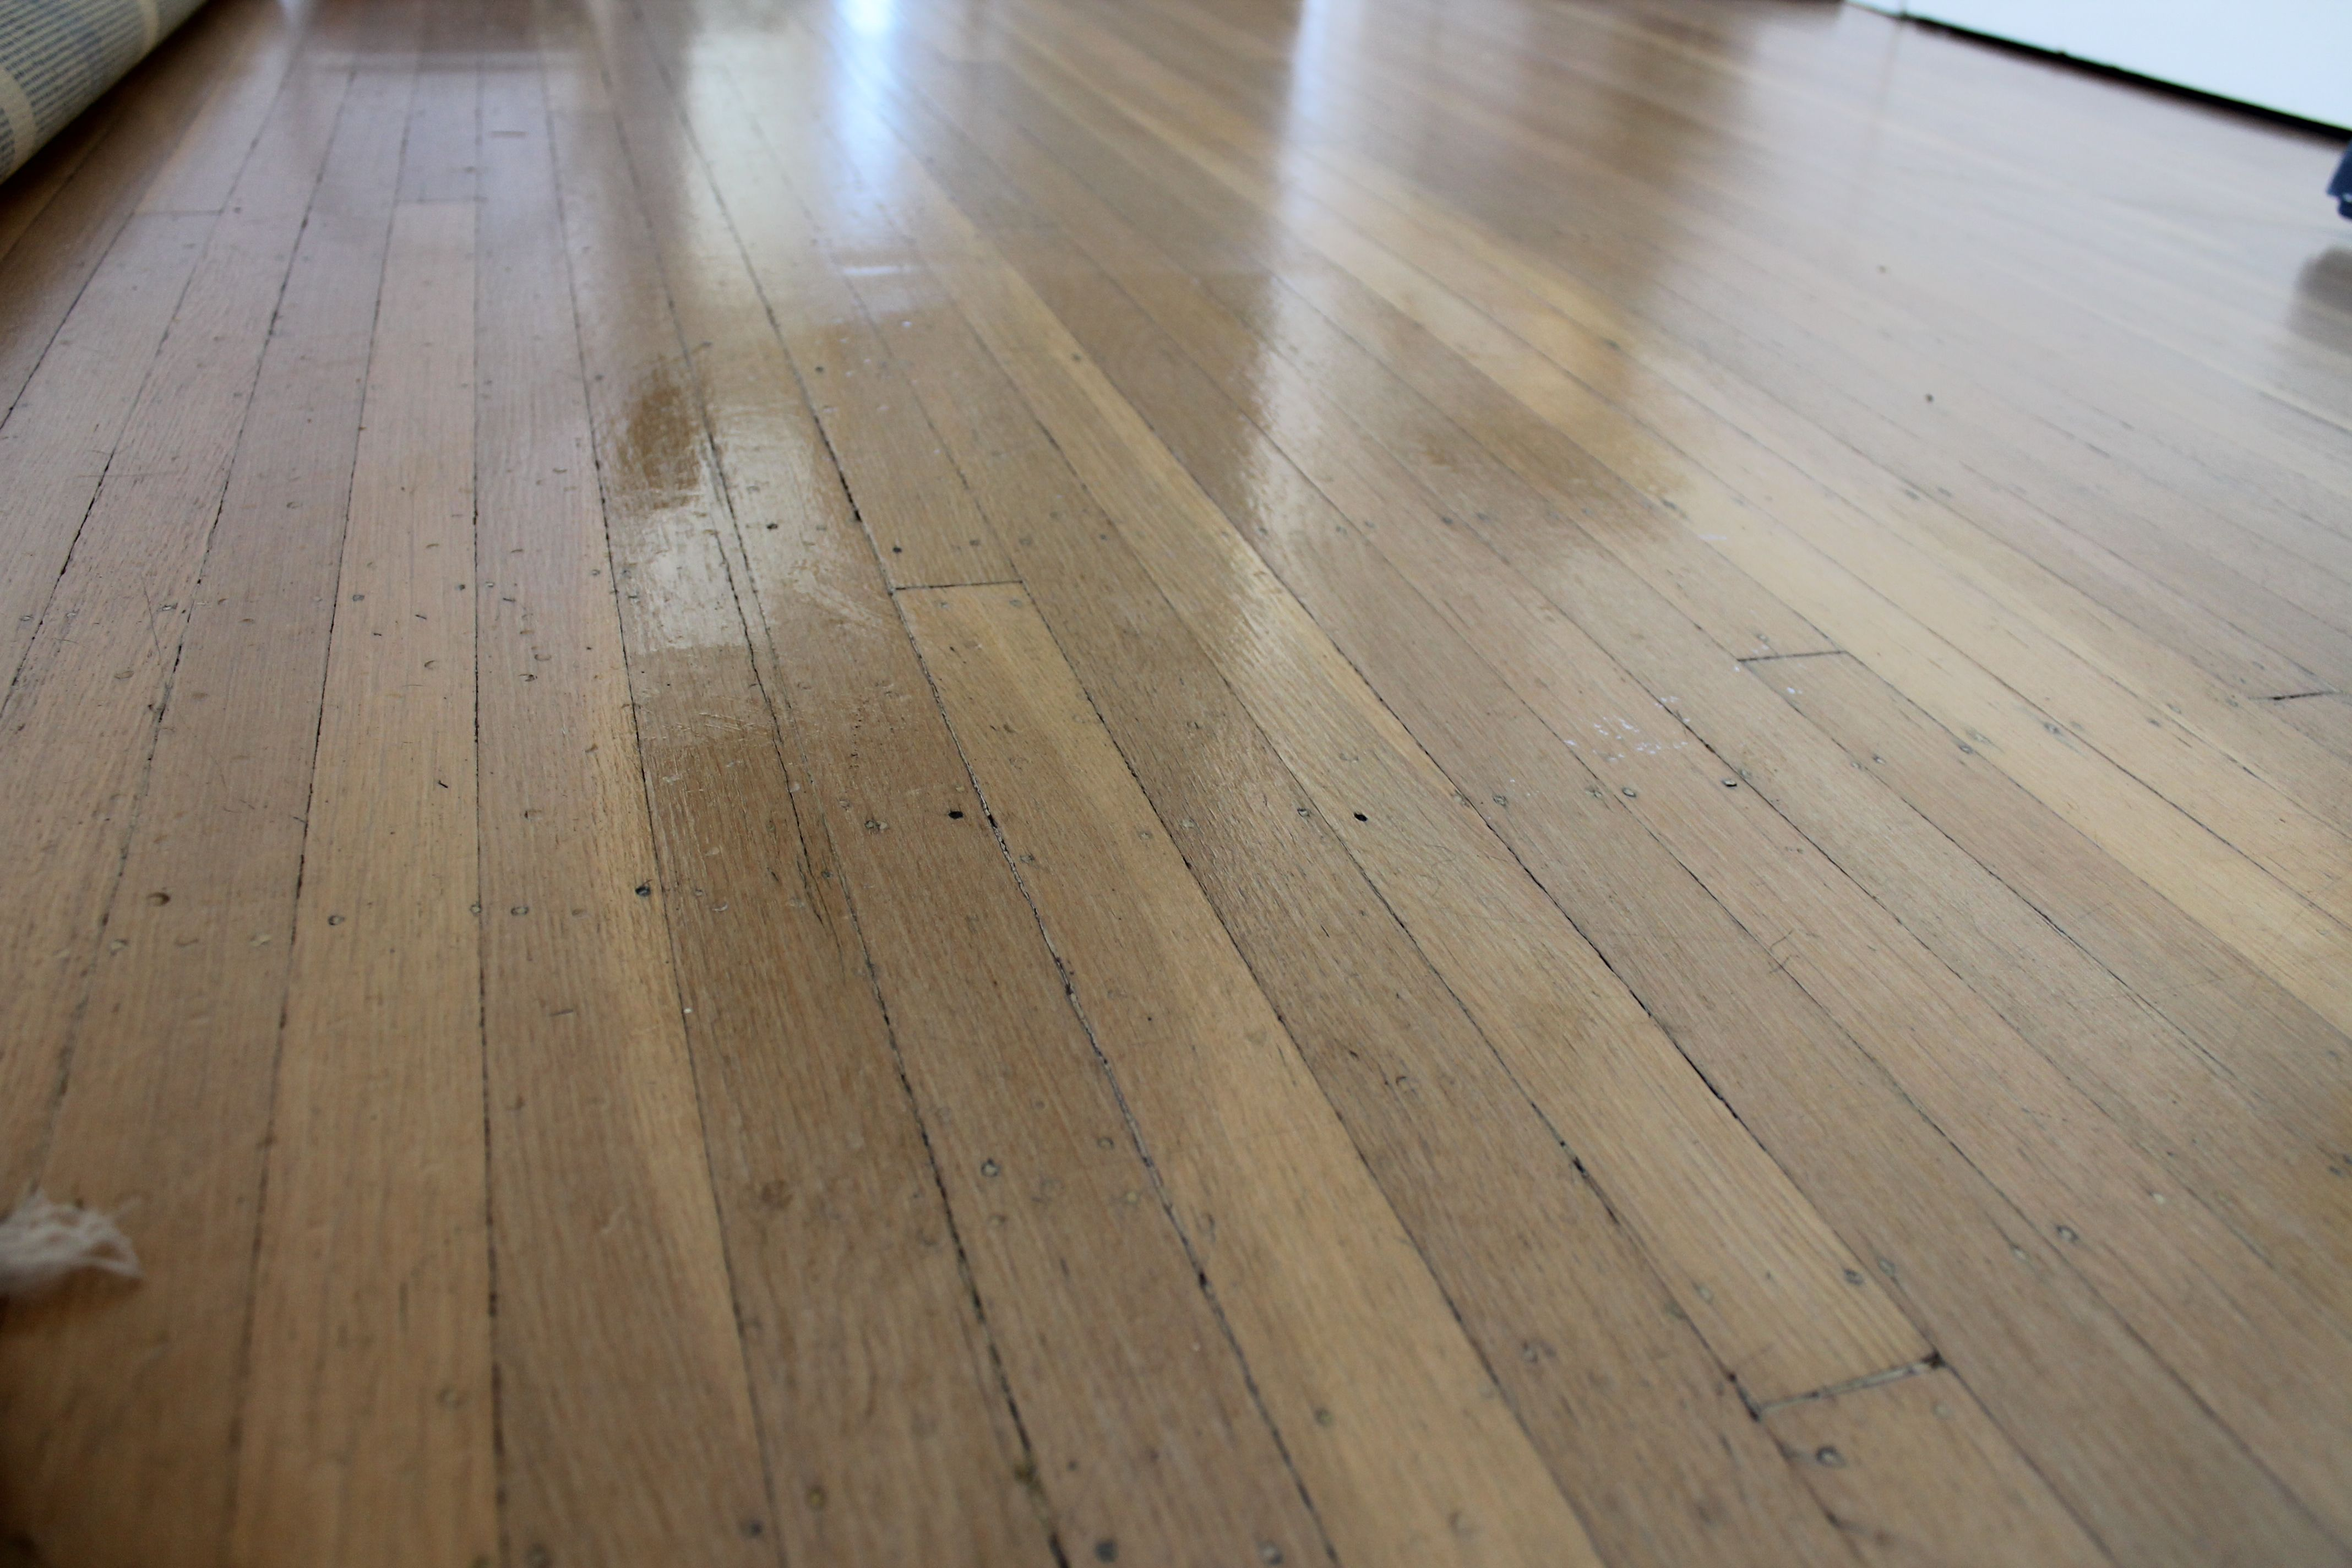 Diy All Natural Wood Floor Polish Cleaning Connections Homemade Wood Cleaner Wood Floor Polish Wood Floor Cleaner